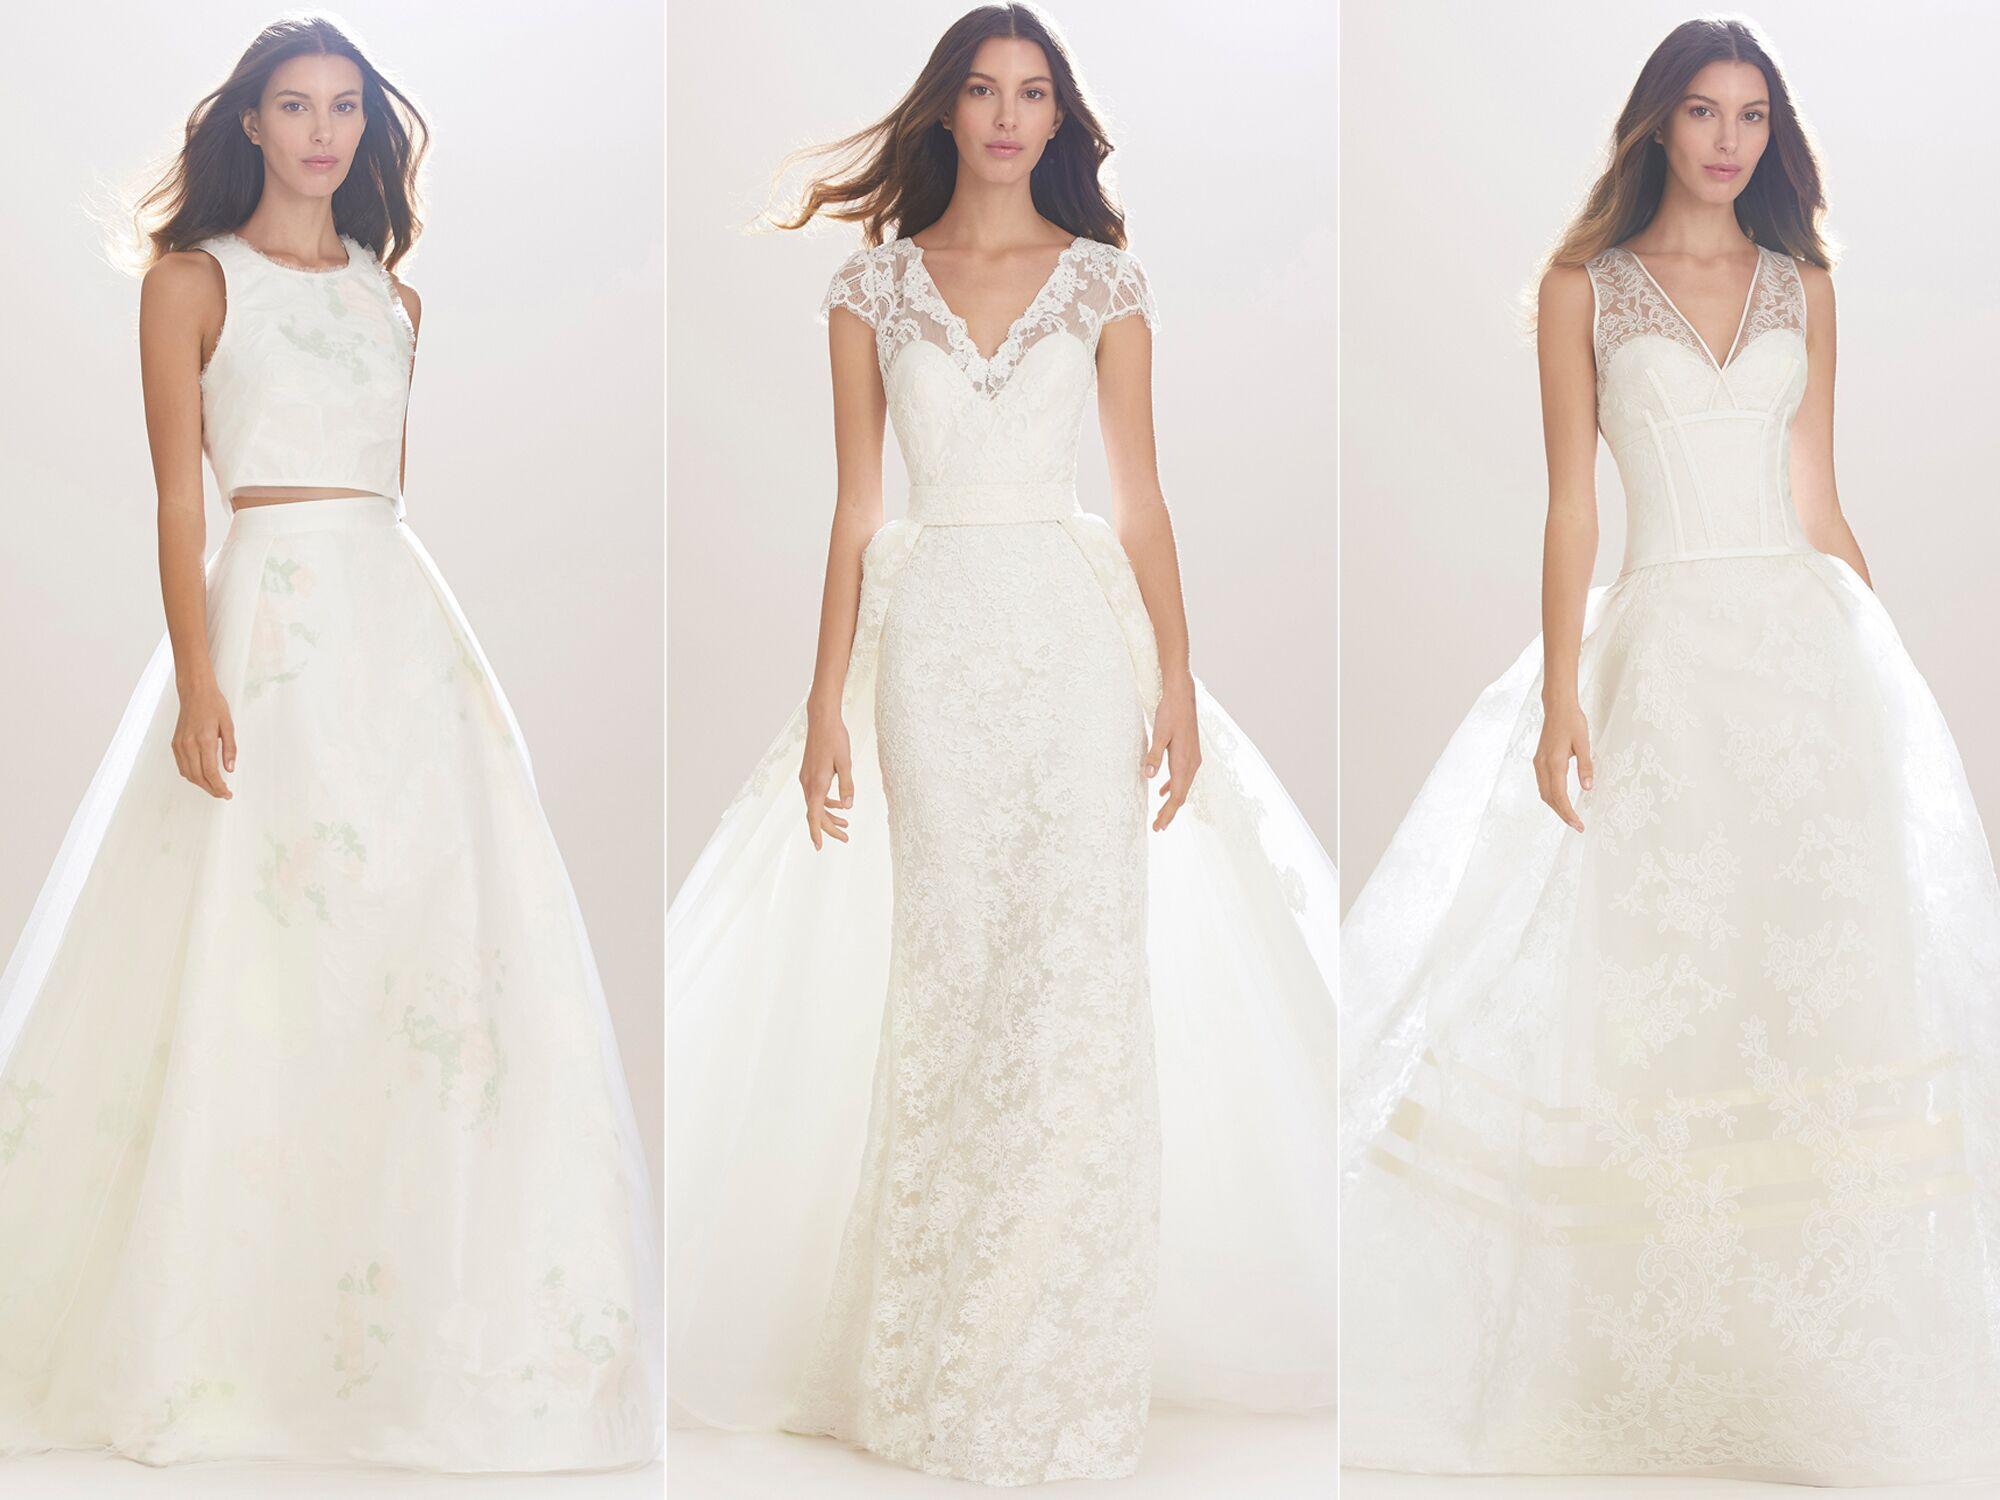 Wedding Gowns 2016: Carolina Herrera Fall 2016 Collection: Wedding Dress Photos